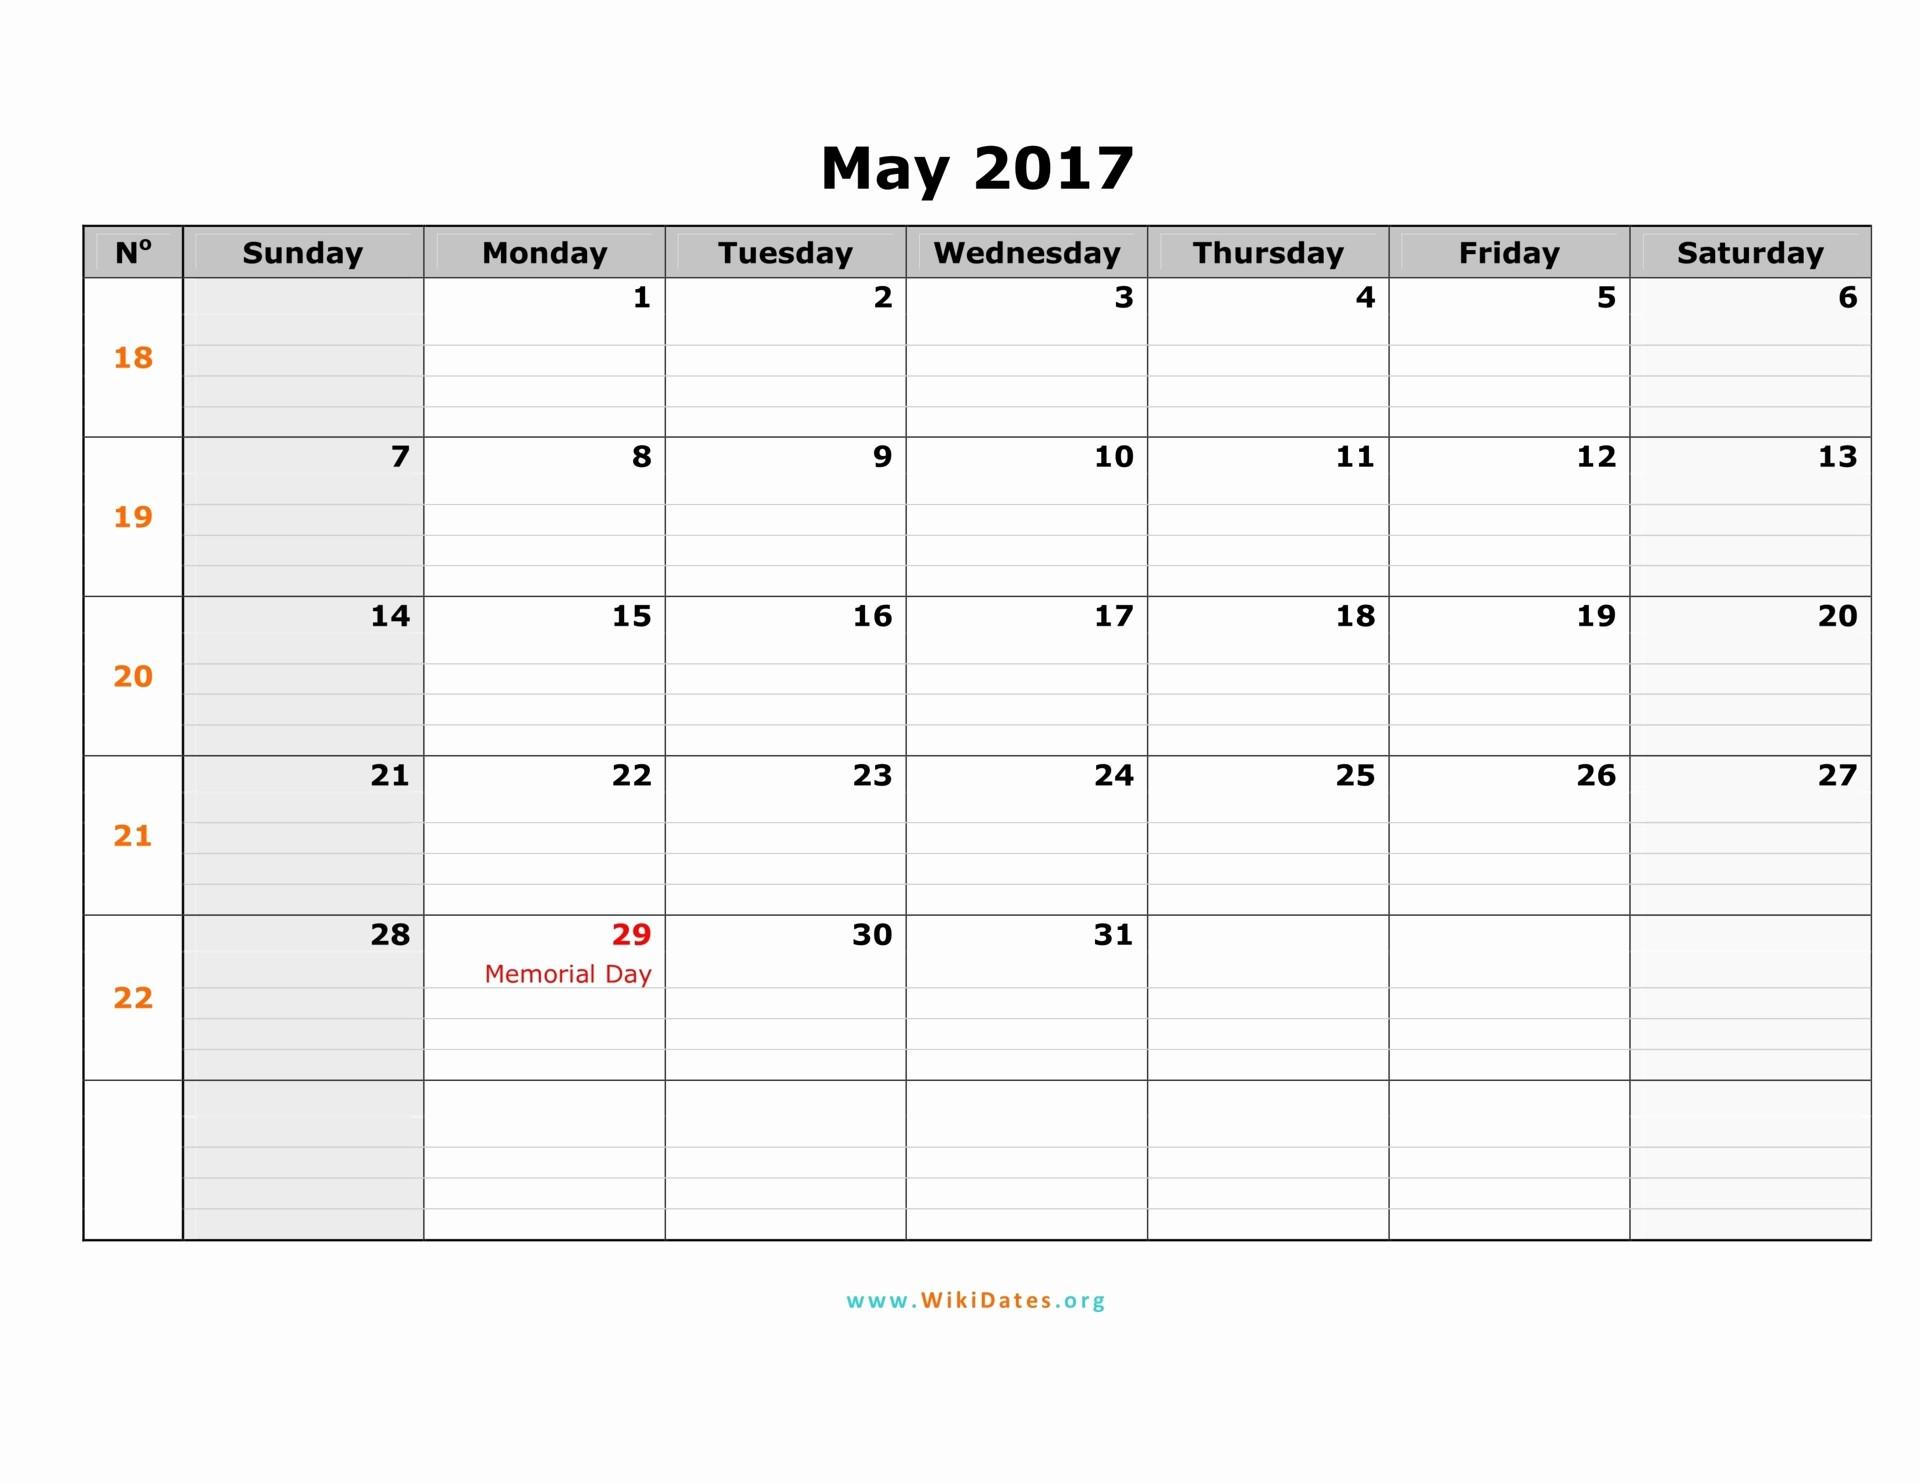 2017 Editable Calendar with Holidays Awesome May 2017 Calendar